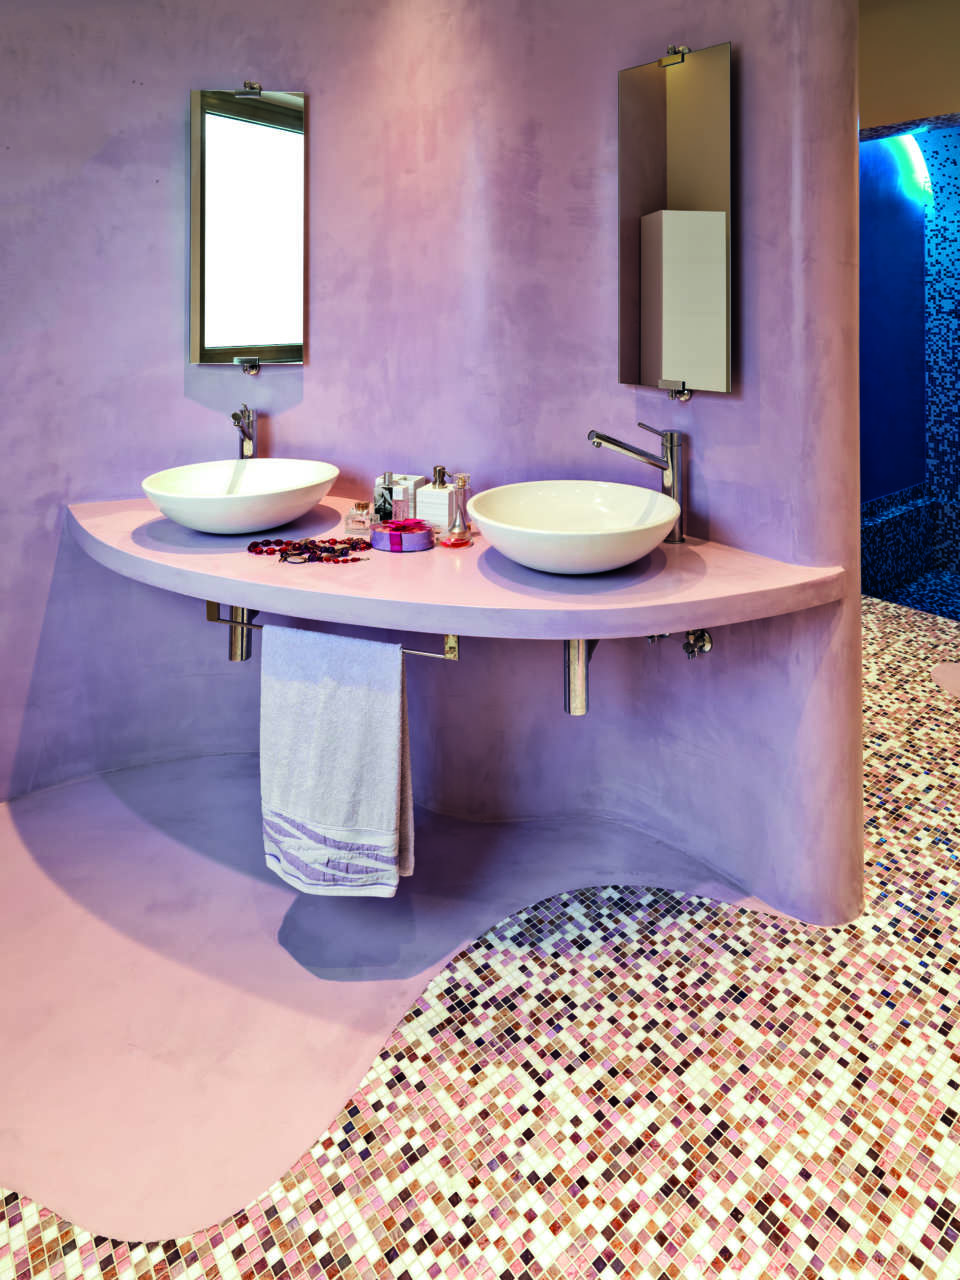 bagno-pareti-lavanda-orientale